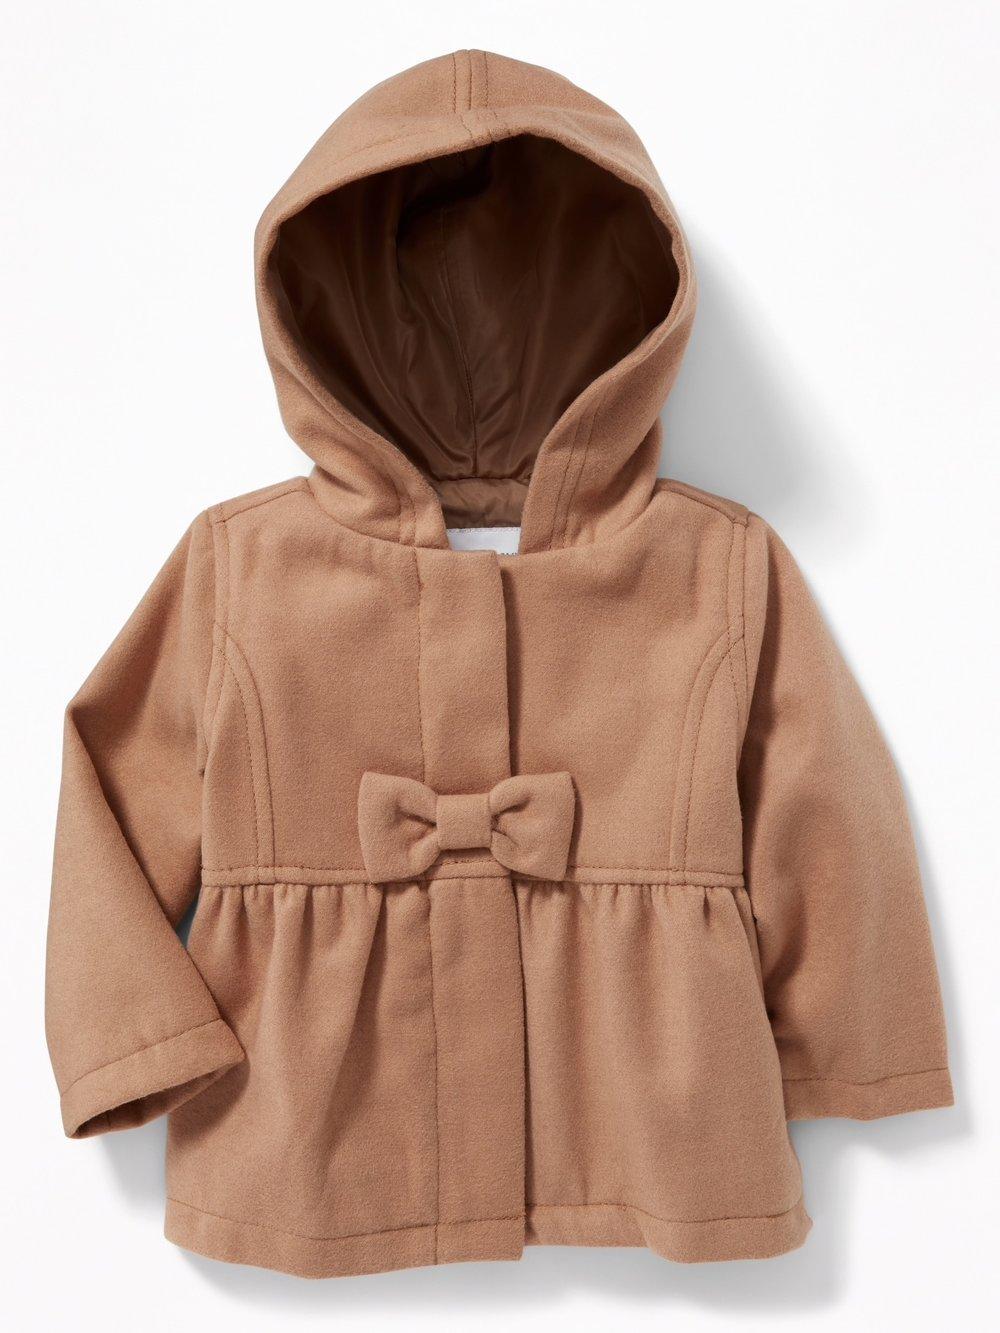 bow baby jacket.jpg